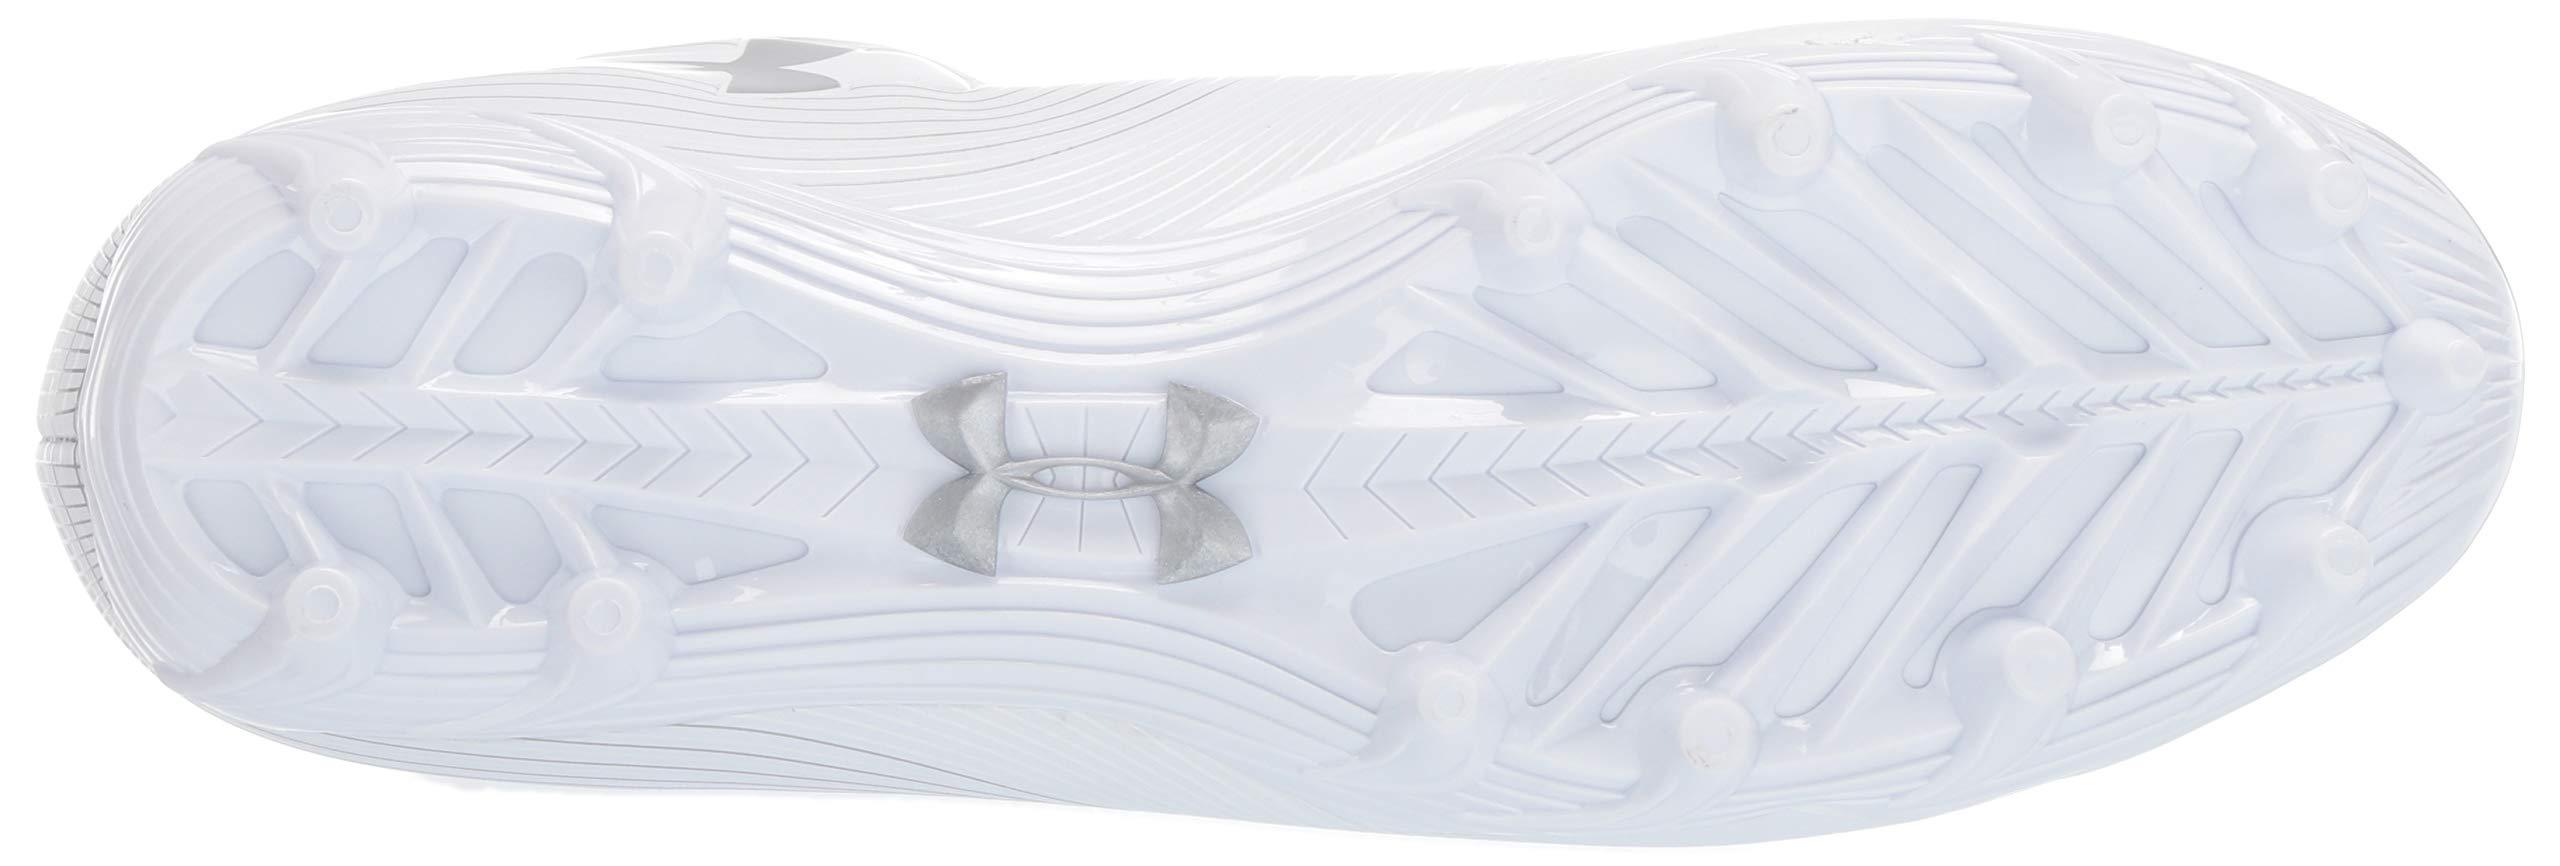 Under Armour Men's Speed Phantom MC Football Shoe, White/White, 7.5 M US by Under Armour (Image #3)